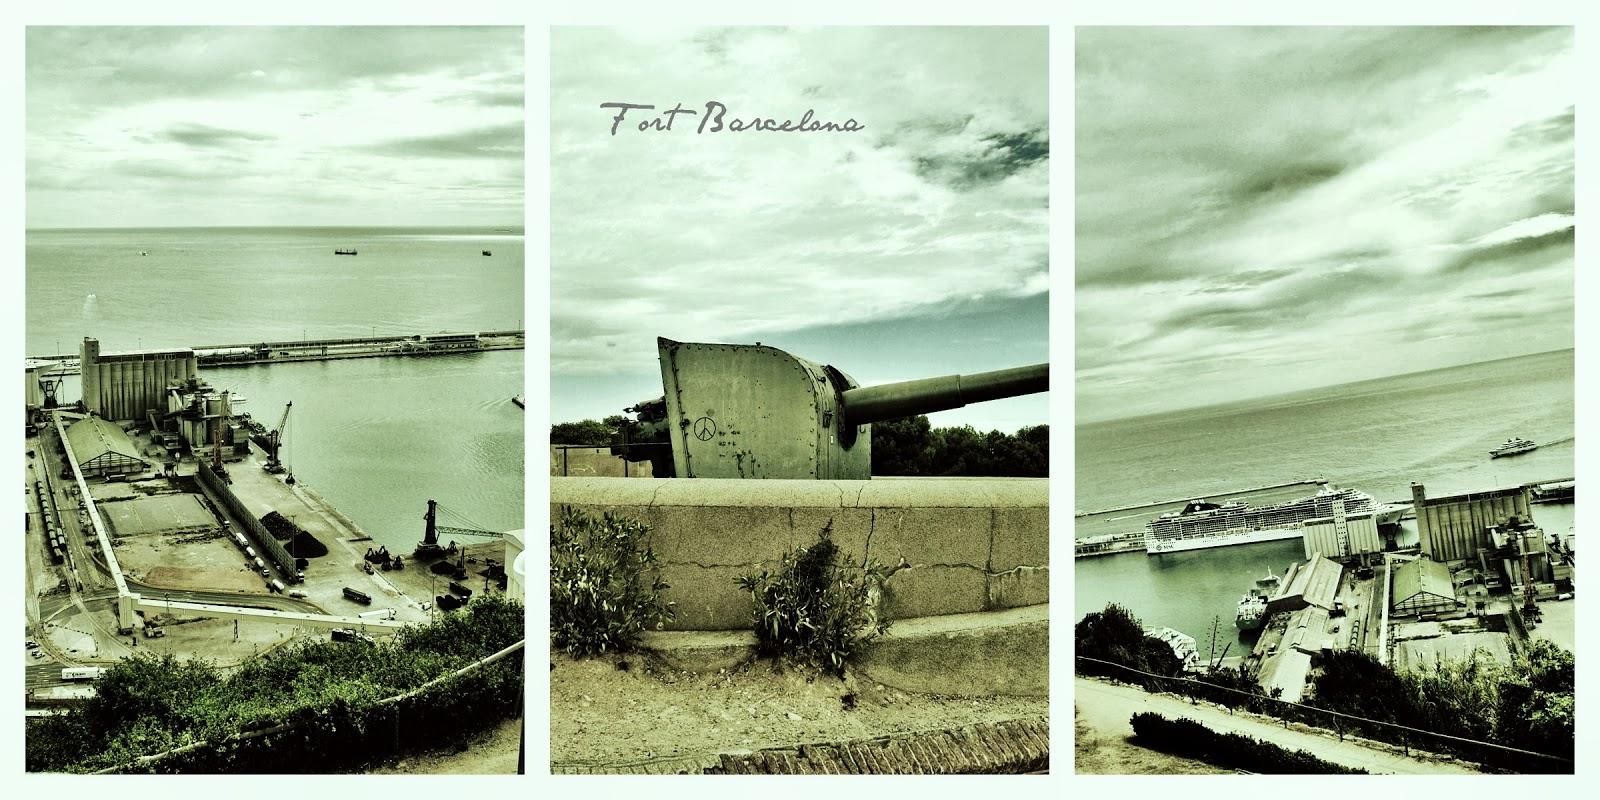 fort Barcelona